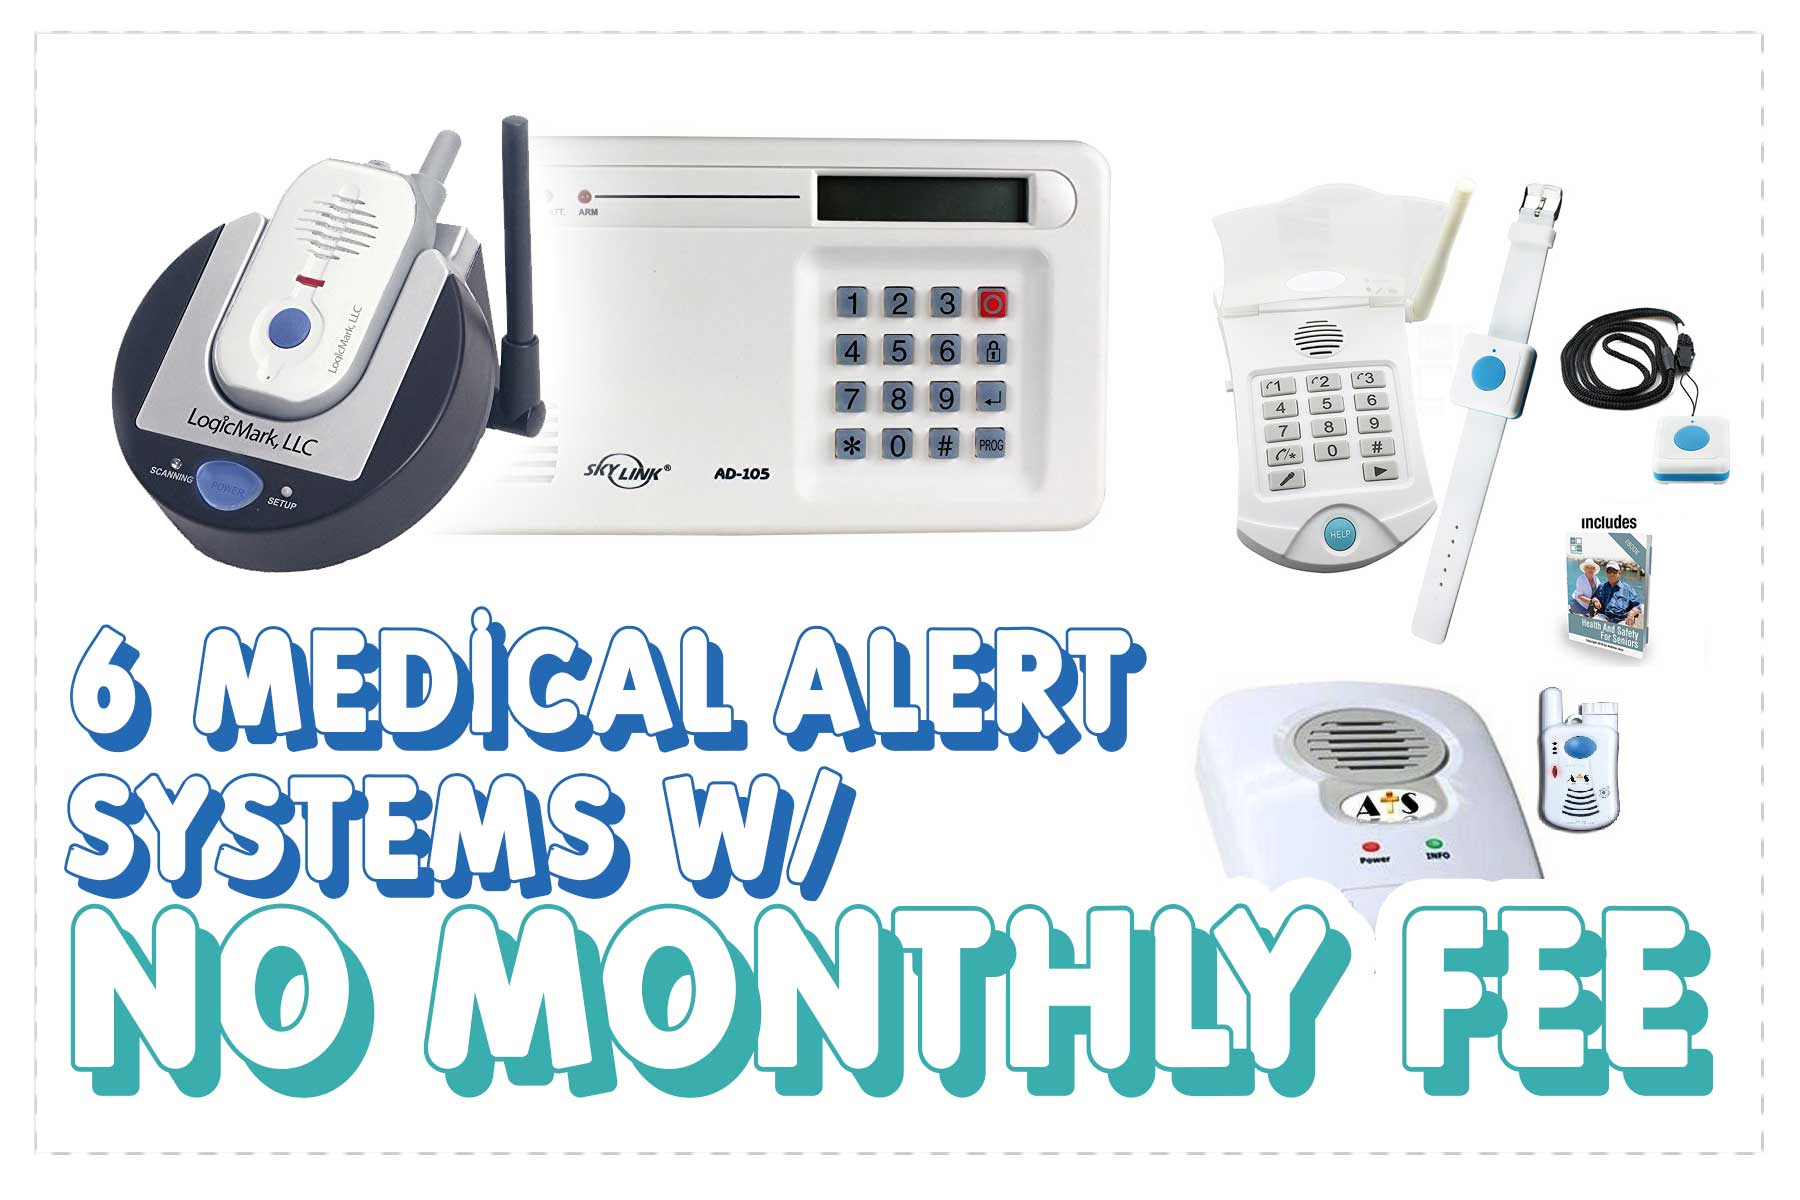 EMERGENCY PHONE DIALER 911 LIFE LINE ALERT MEDICAL SYSTEM -NO MONTHLY FEES-